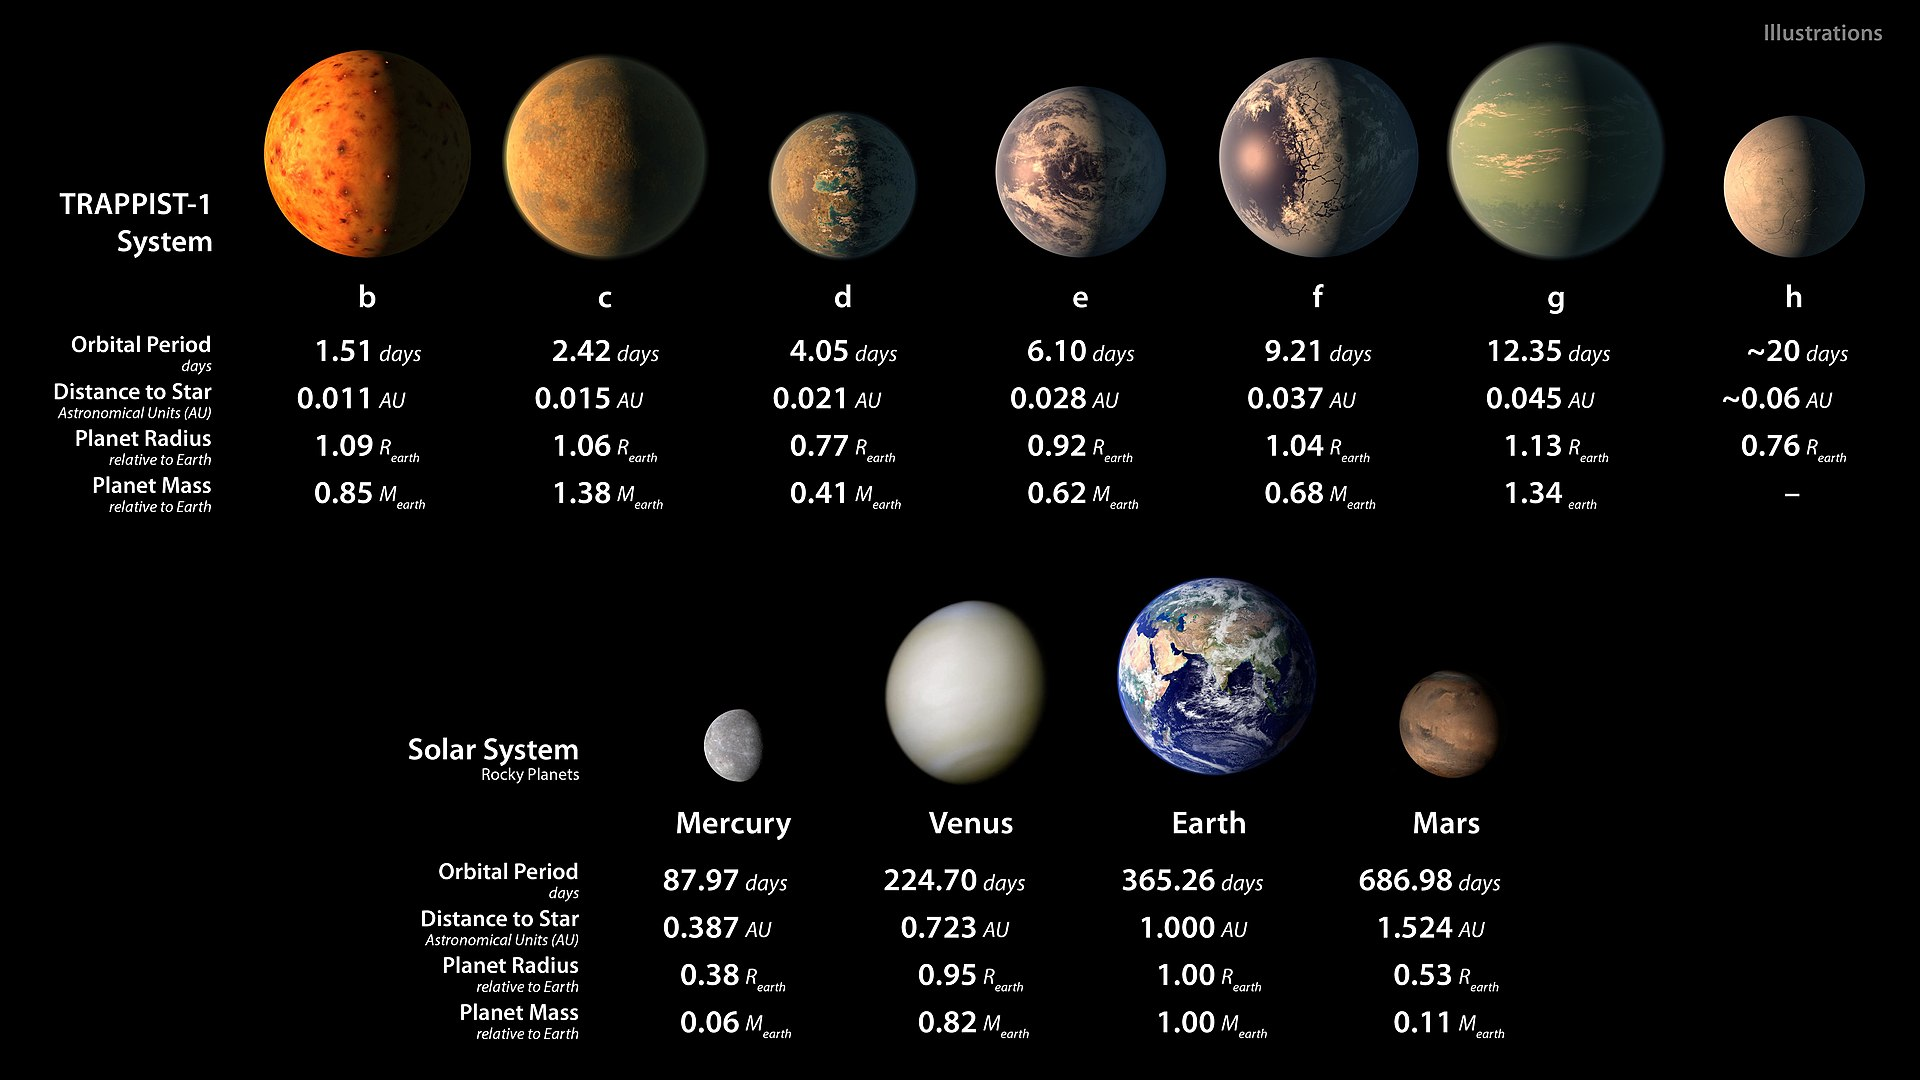 1920px-PIA21425_-_TRAPPIST-1_Statistics_